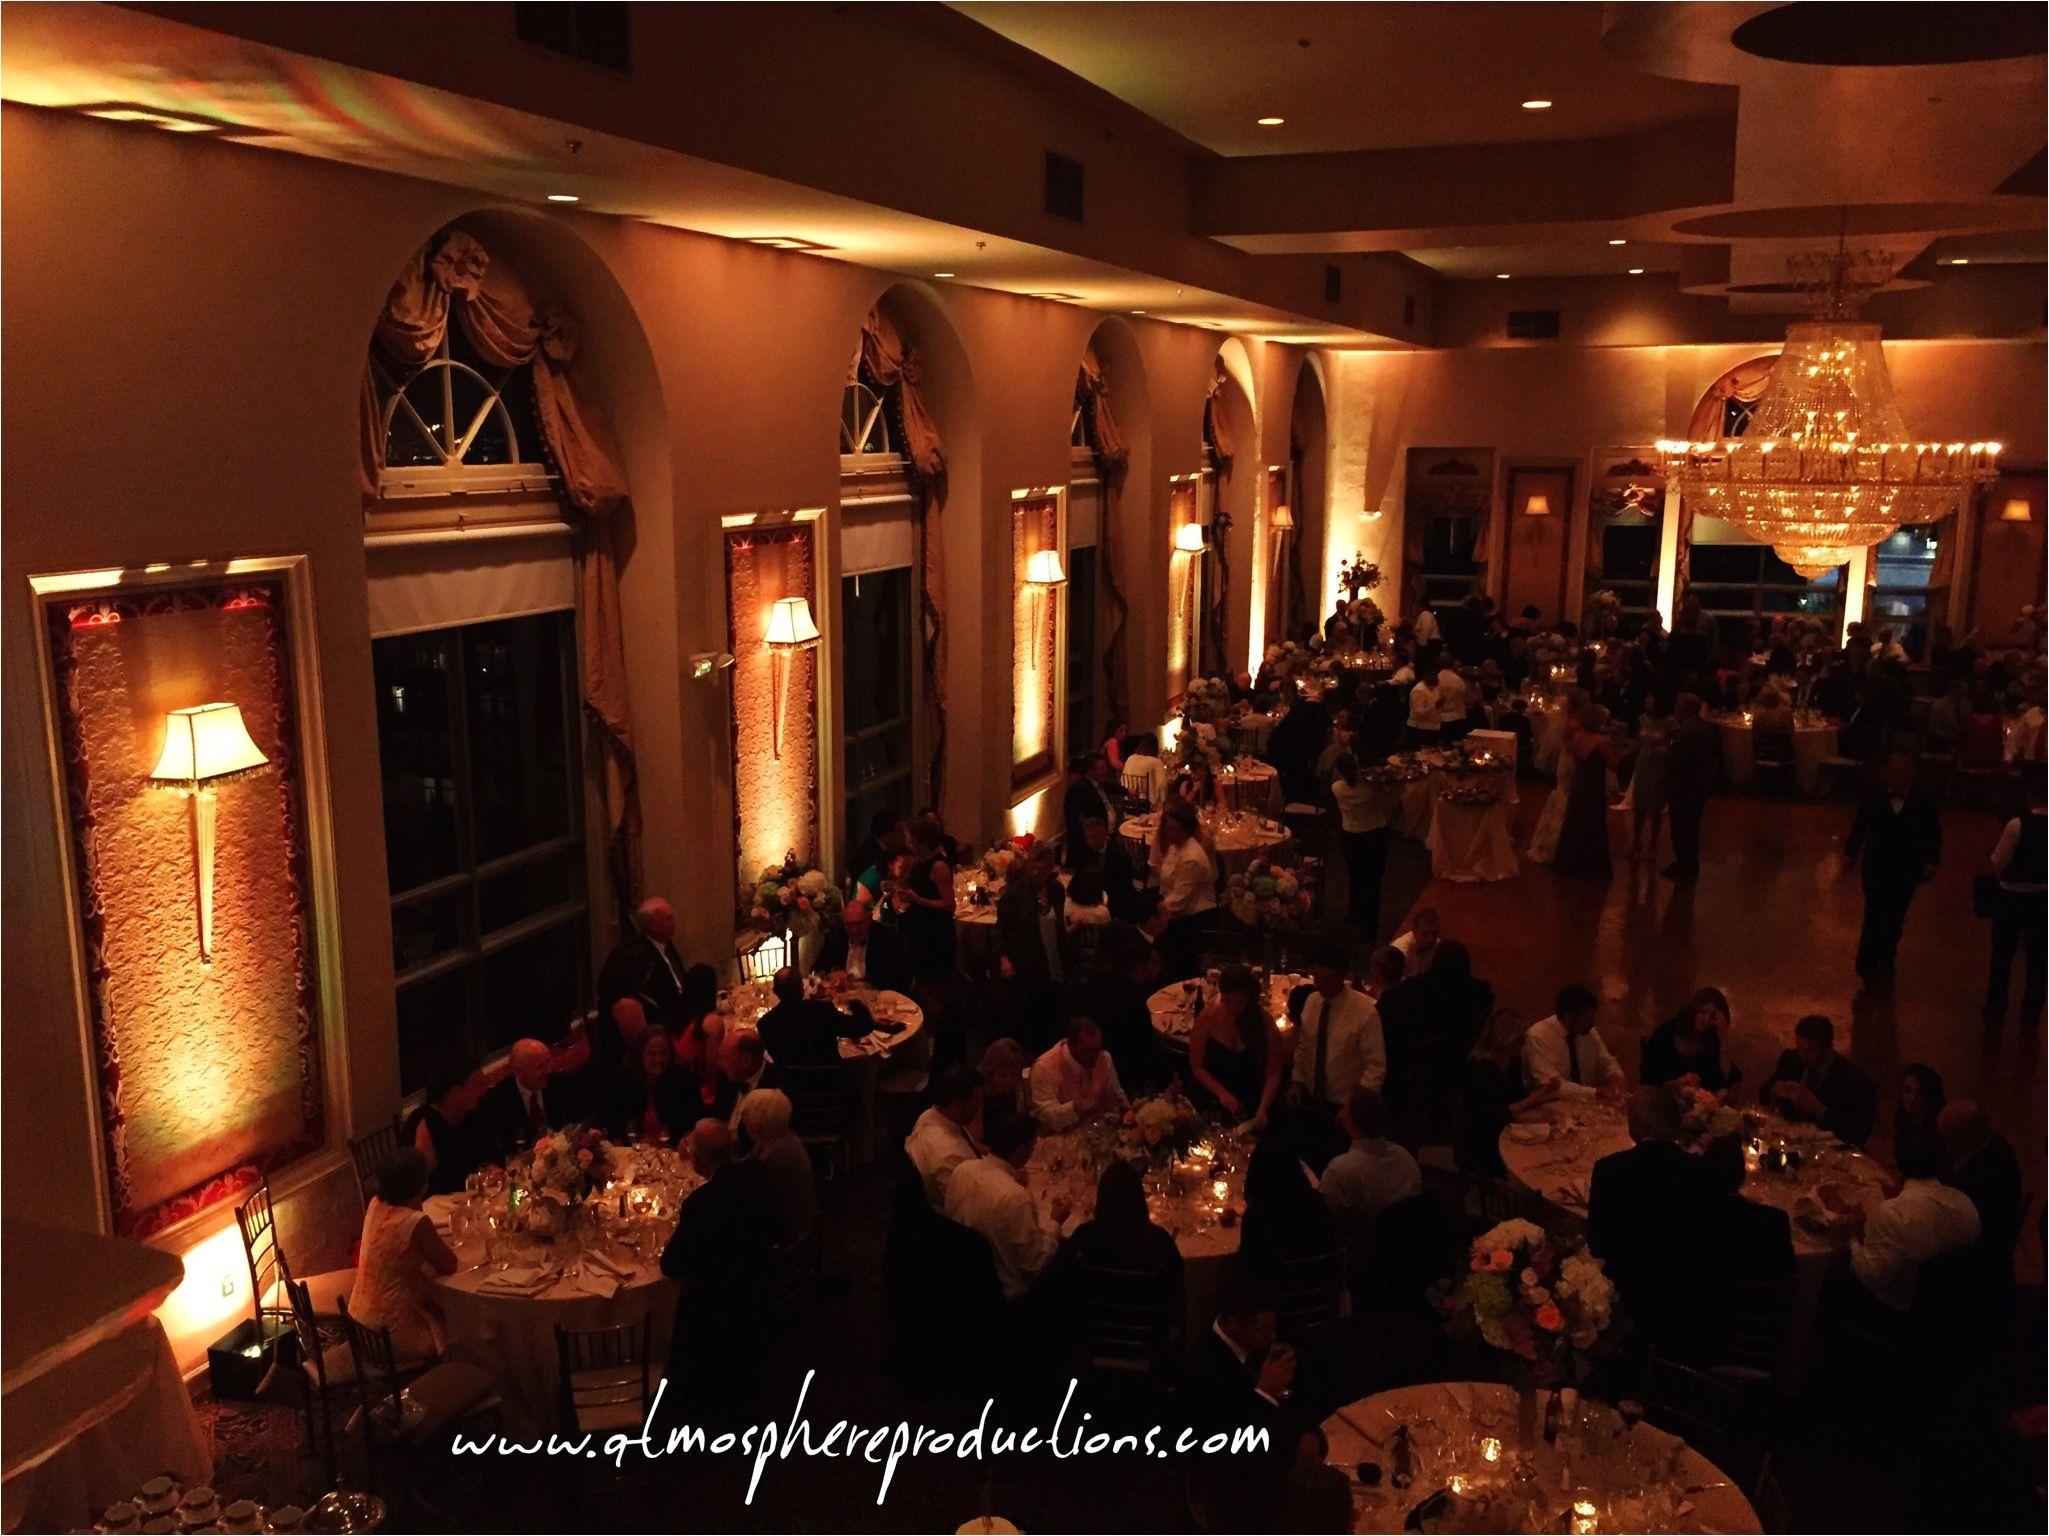 weddings a· hartford ct venue ann howard the bond hotel amber uplighting